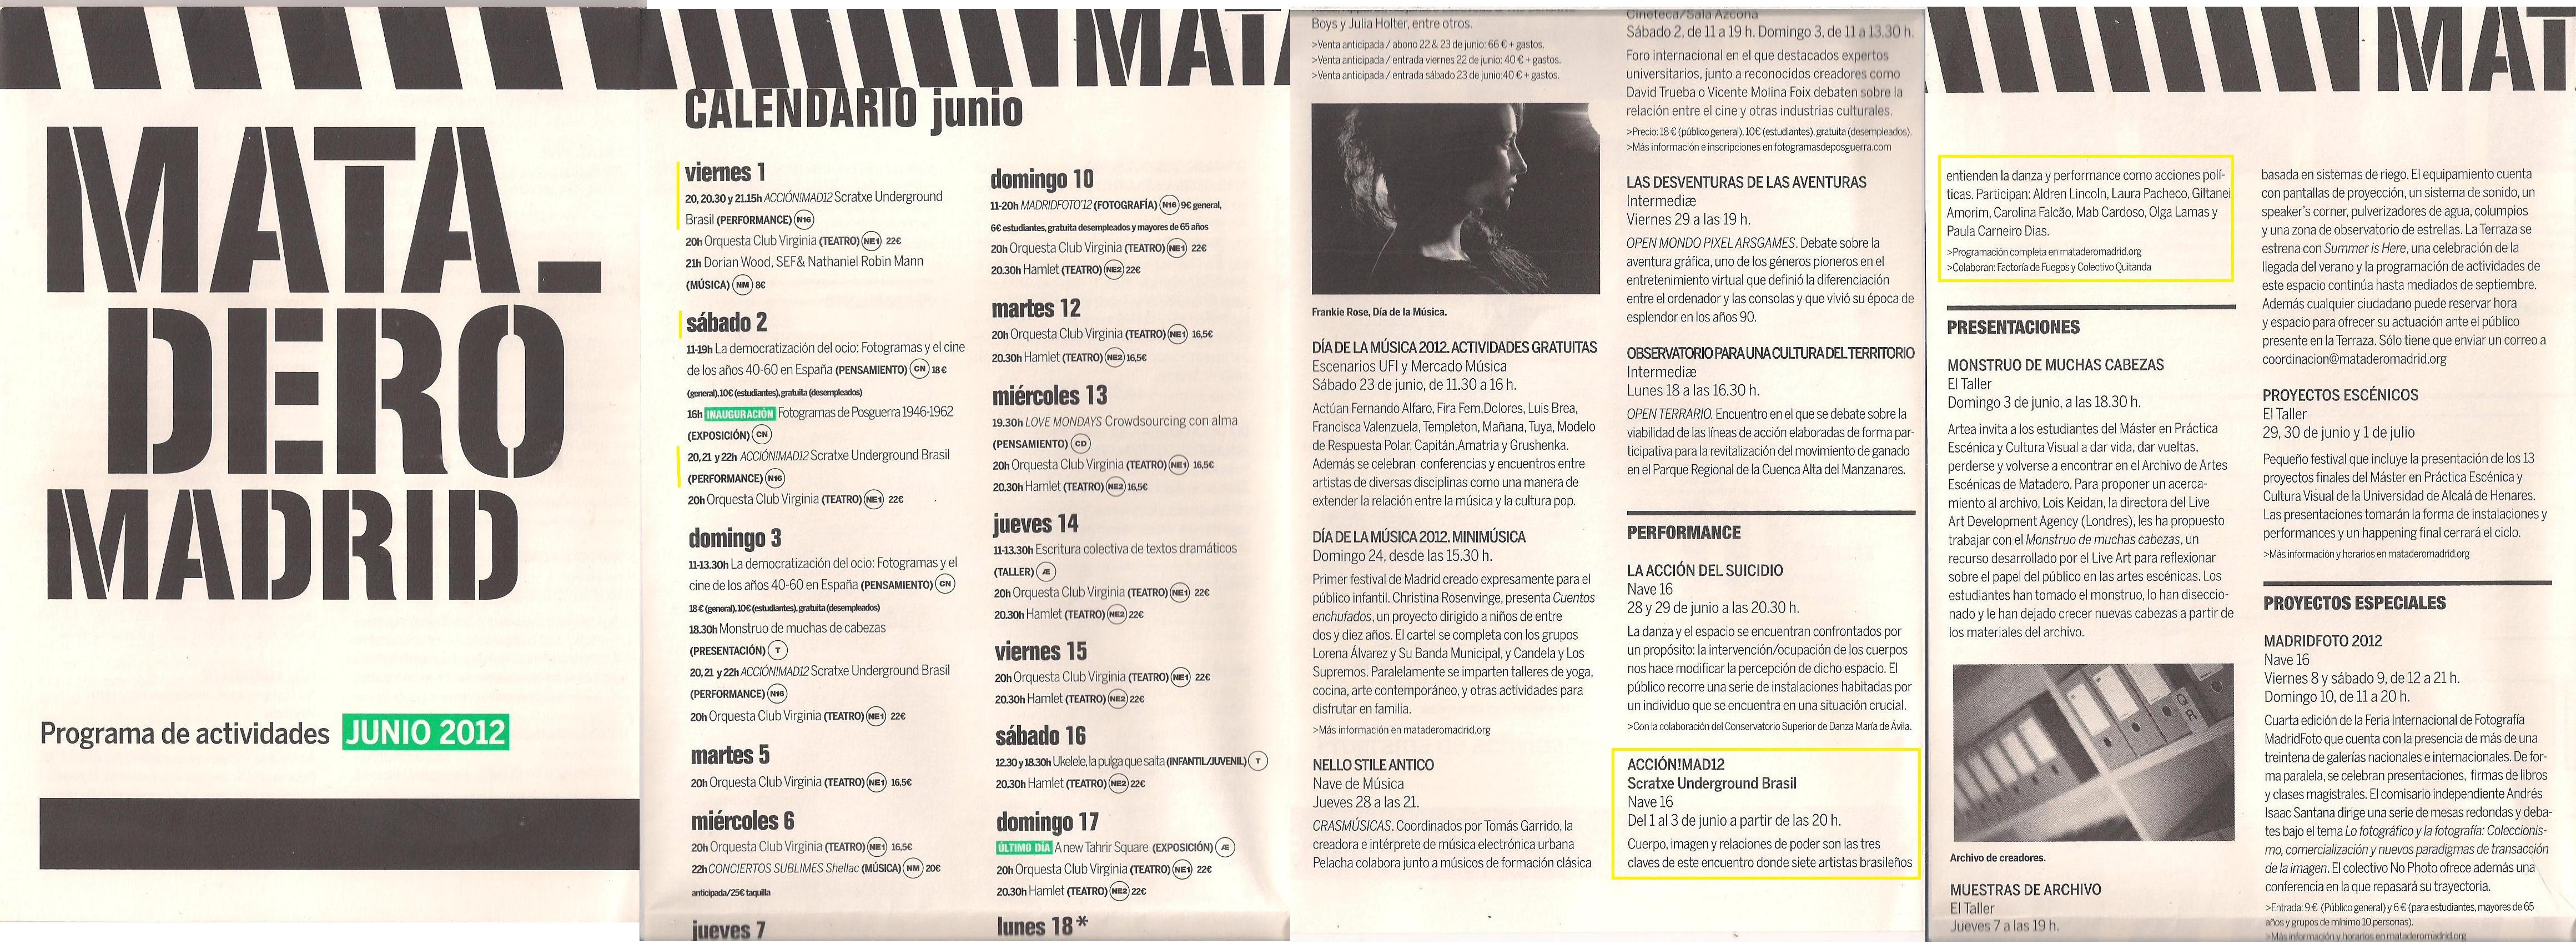 2012_Festival Scratxe Underground_Programa Matadero Madrid